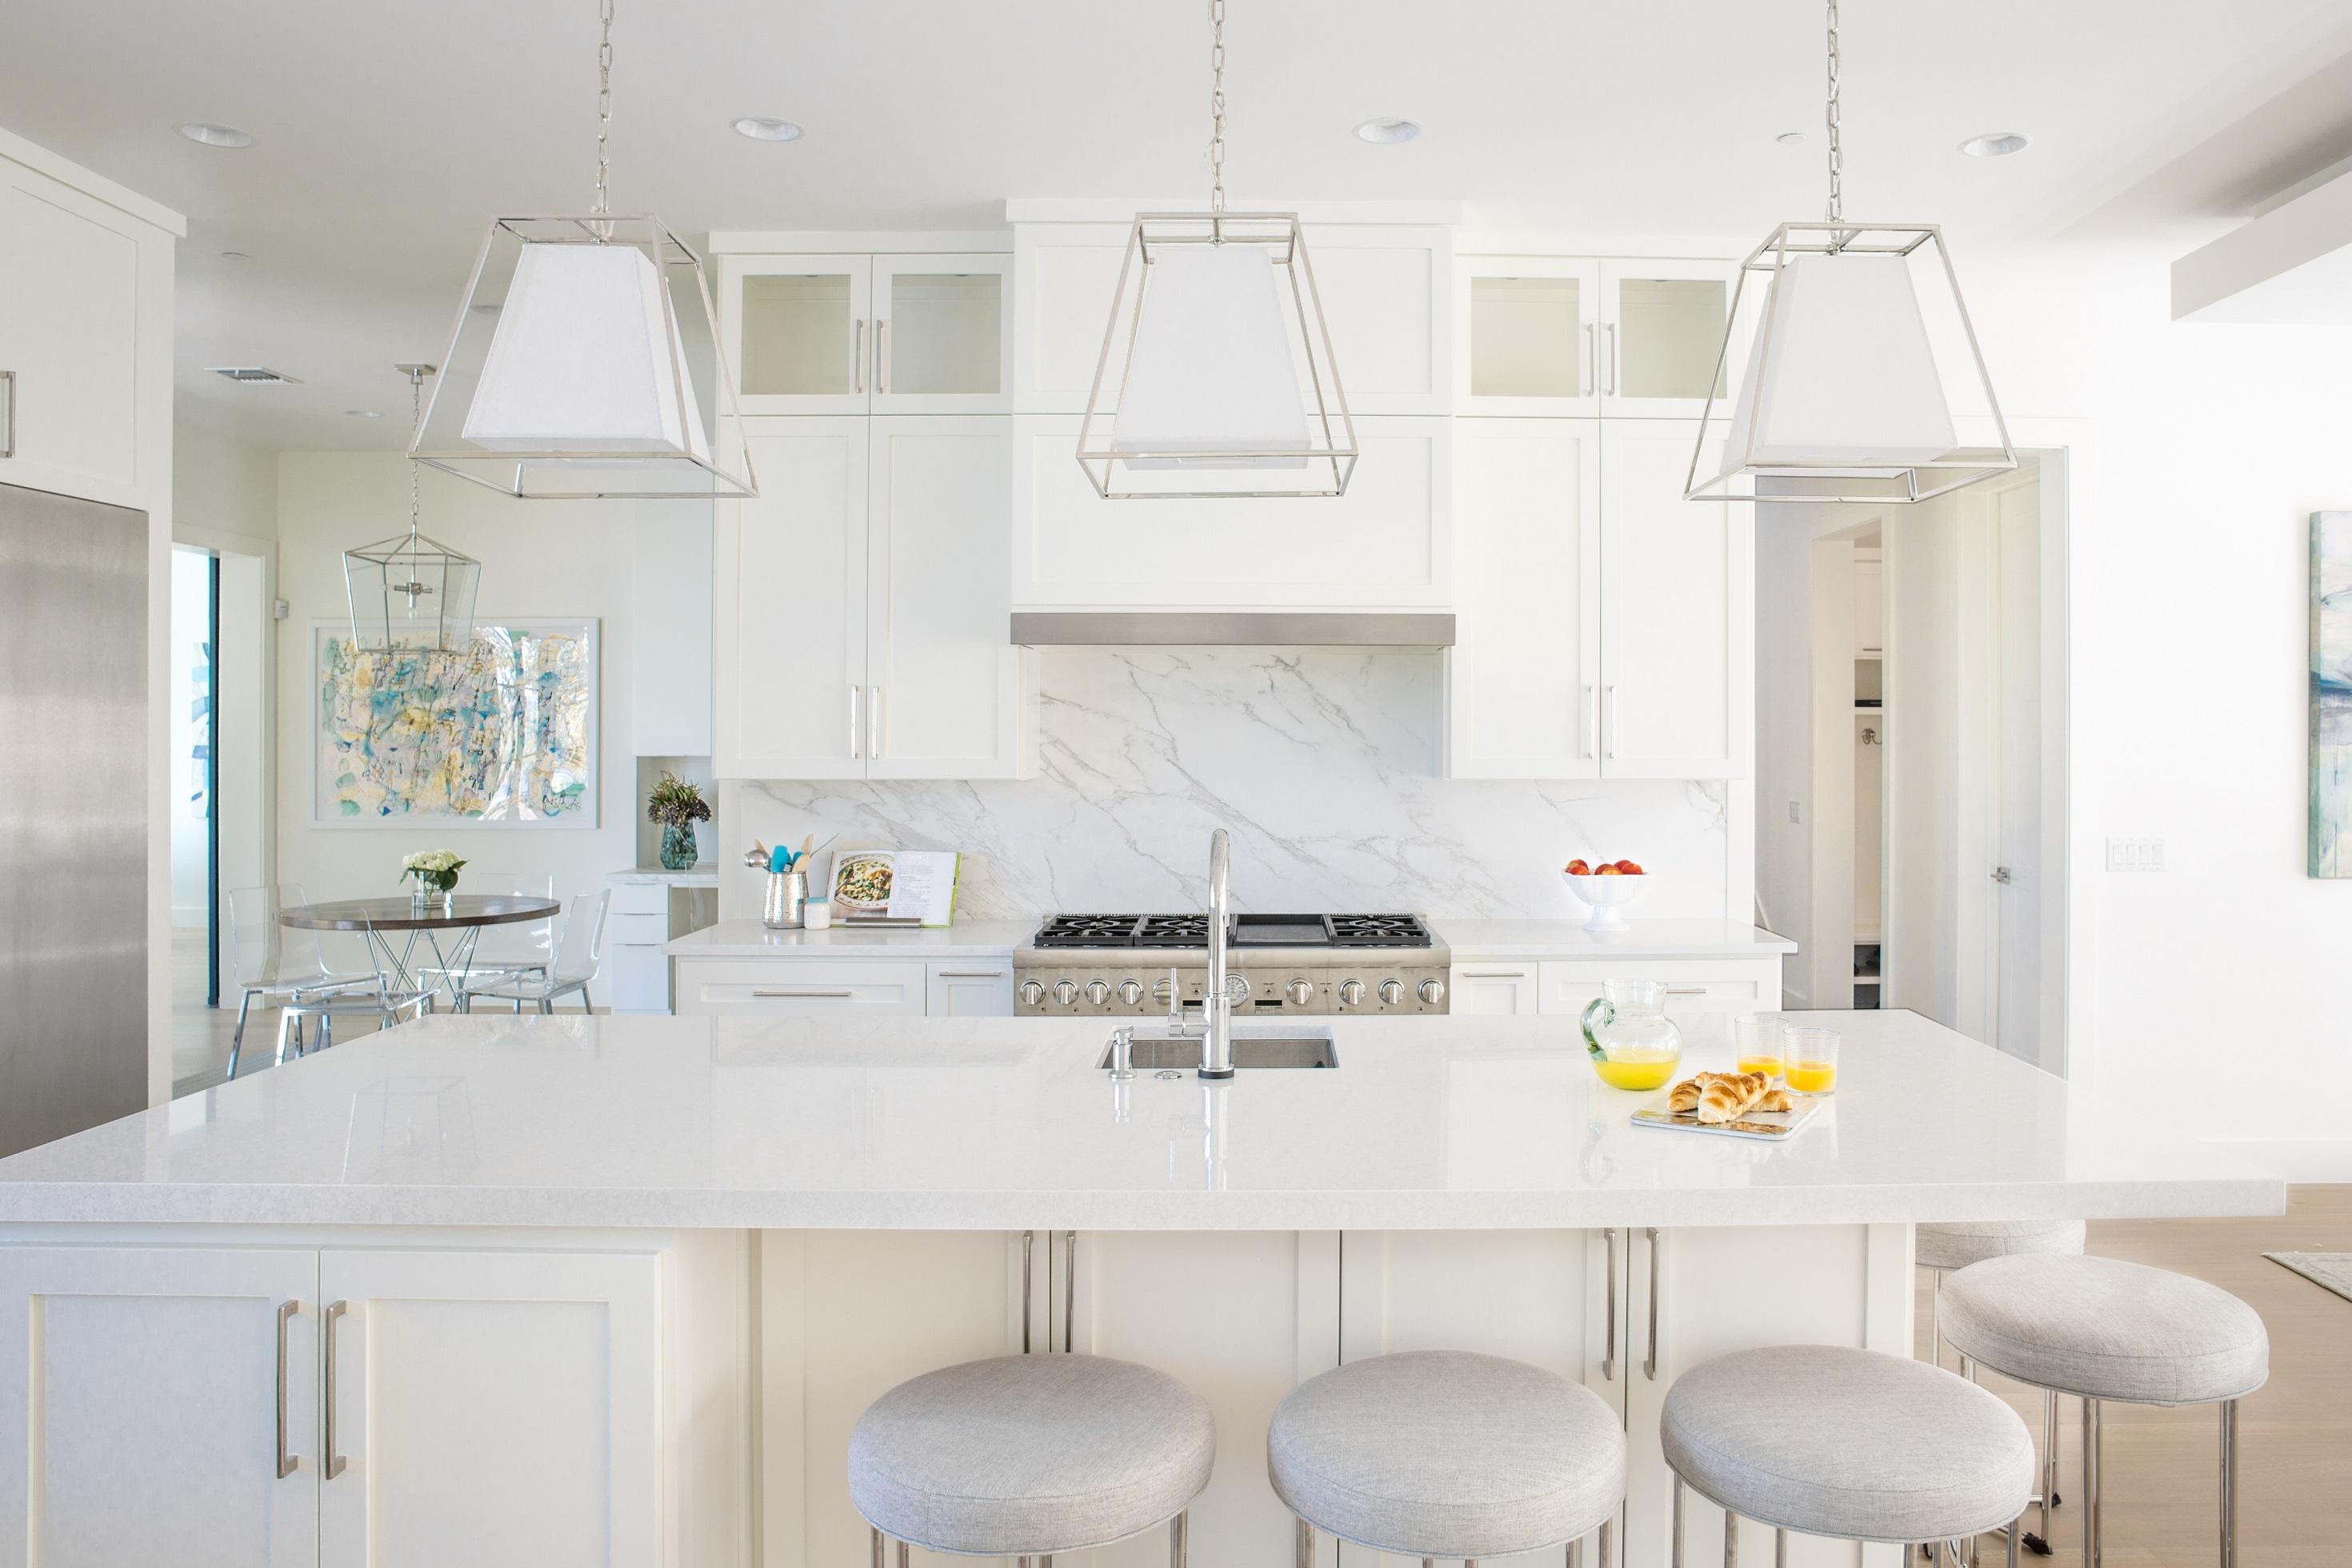 lake-austin-residence-kitchen-bartools